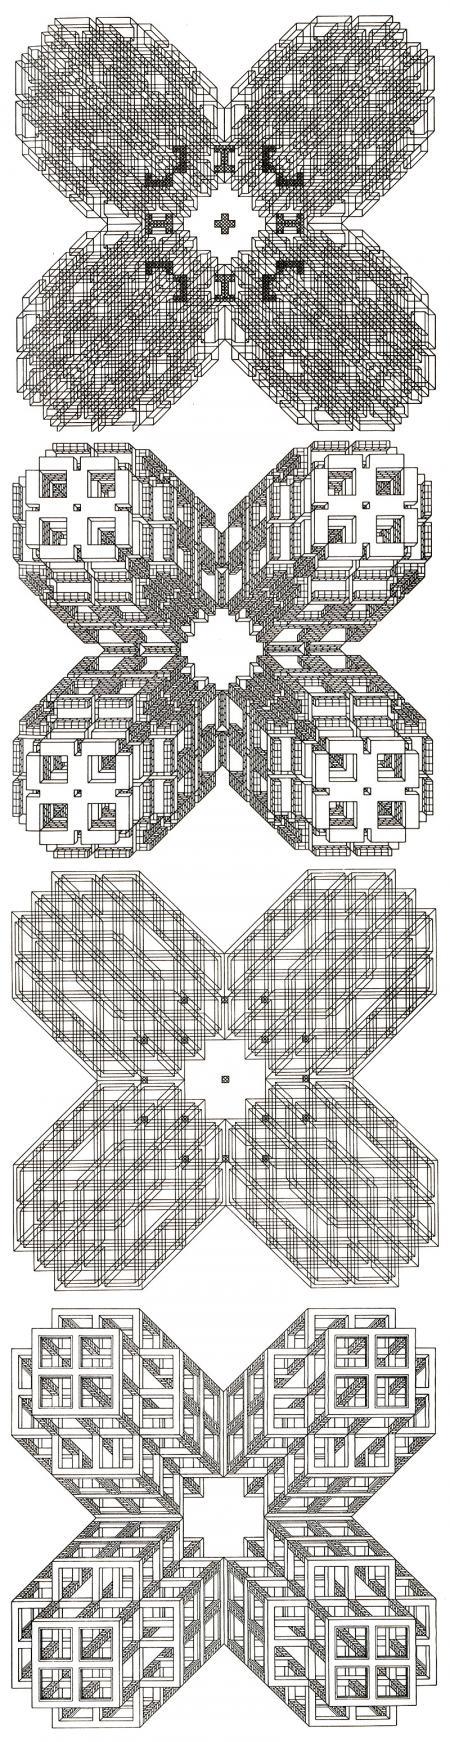 Stanley Tigerman and GL Crabtree. A+U 55 July 1975, 45